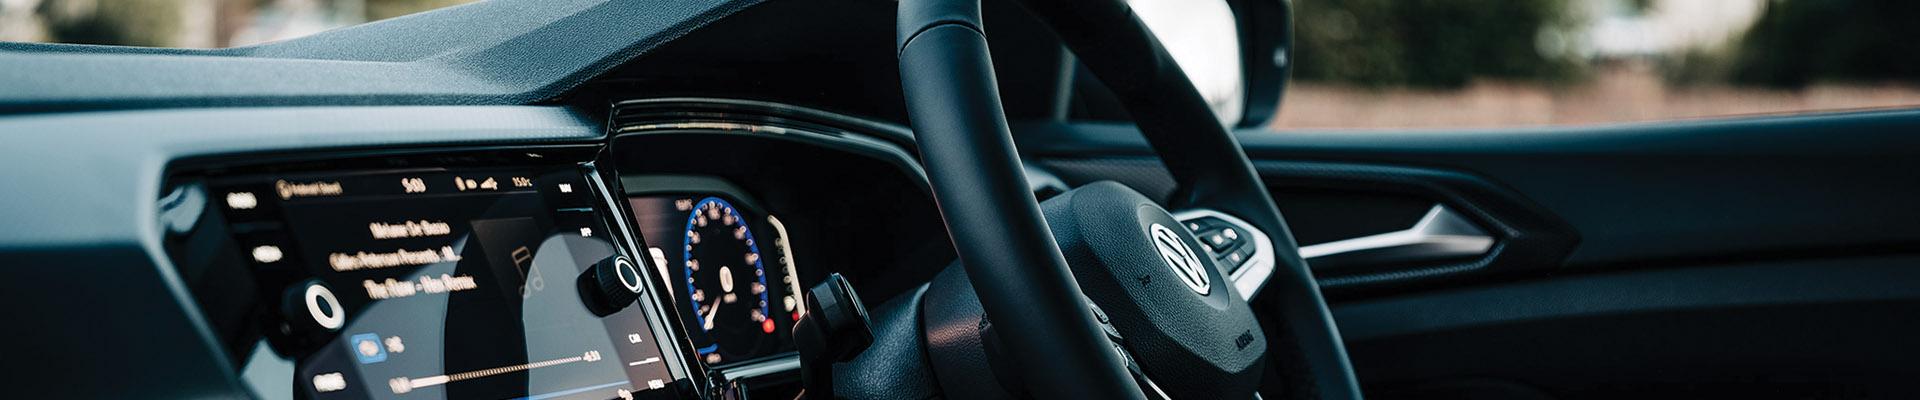 Jackson Motor Company-Value Your Car